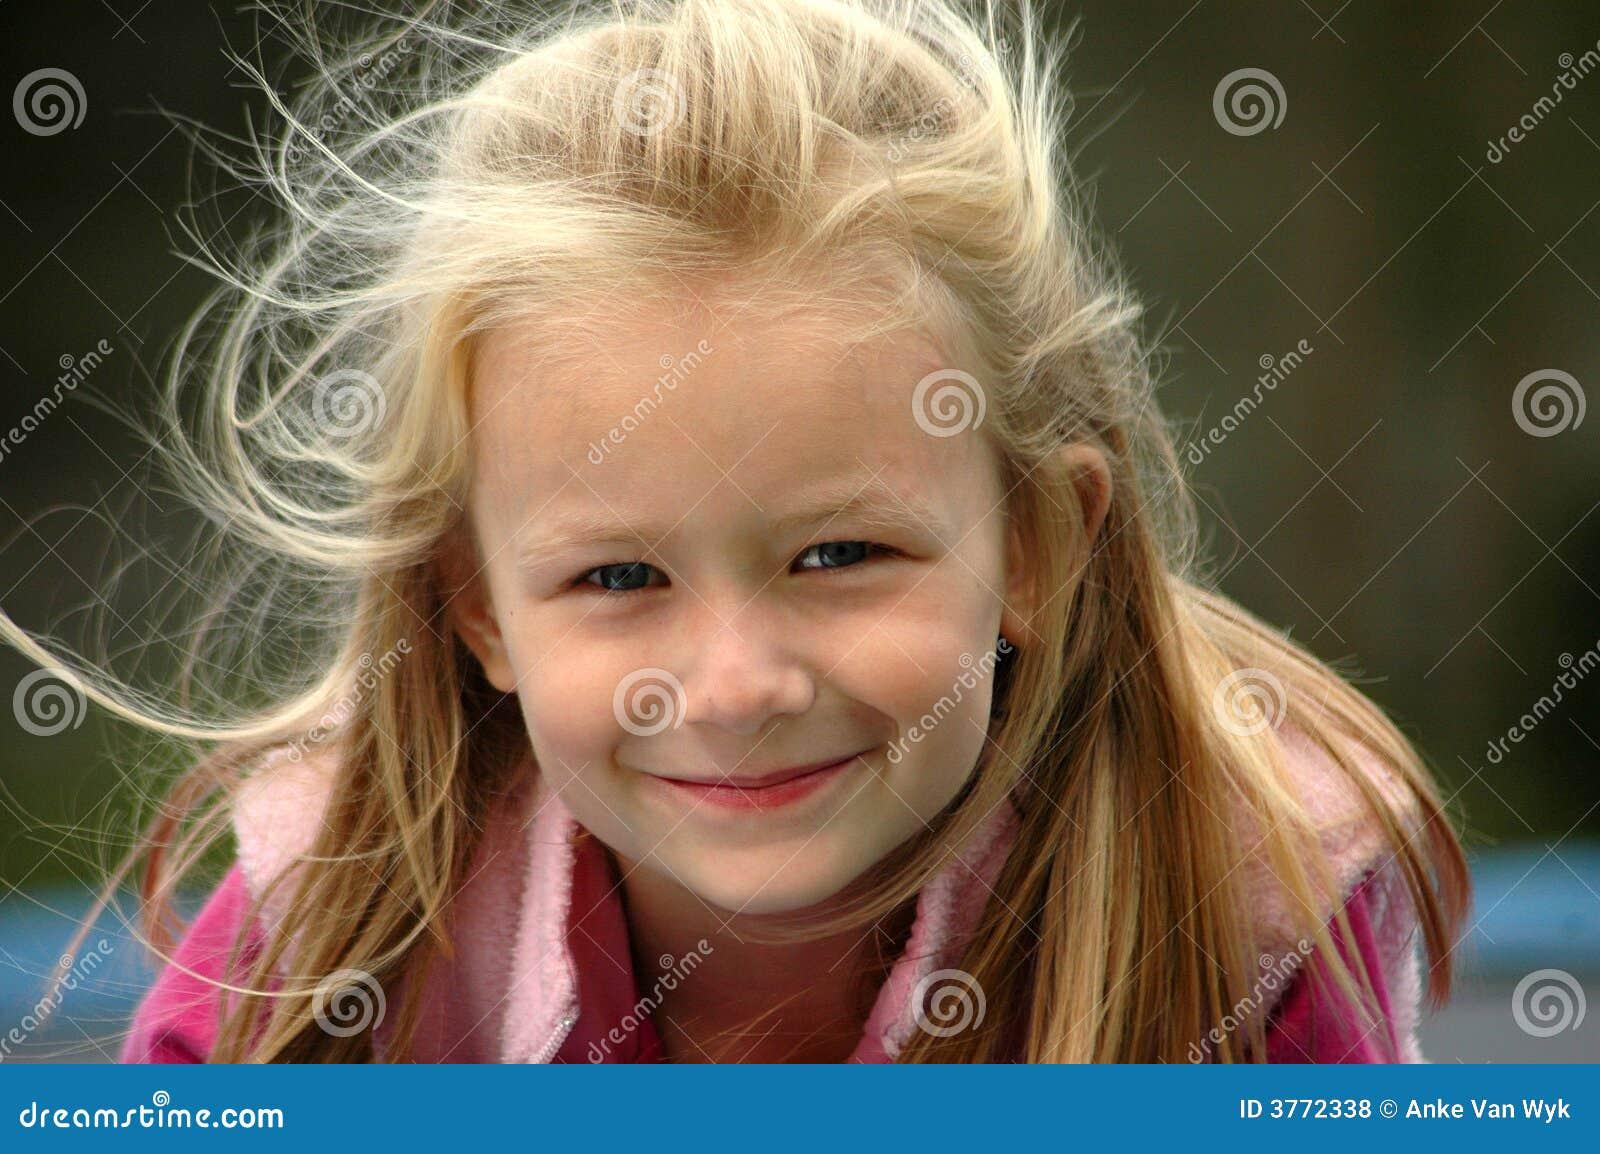 Child natural smile